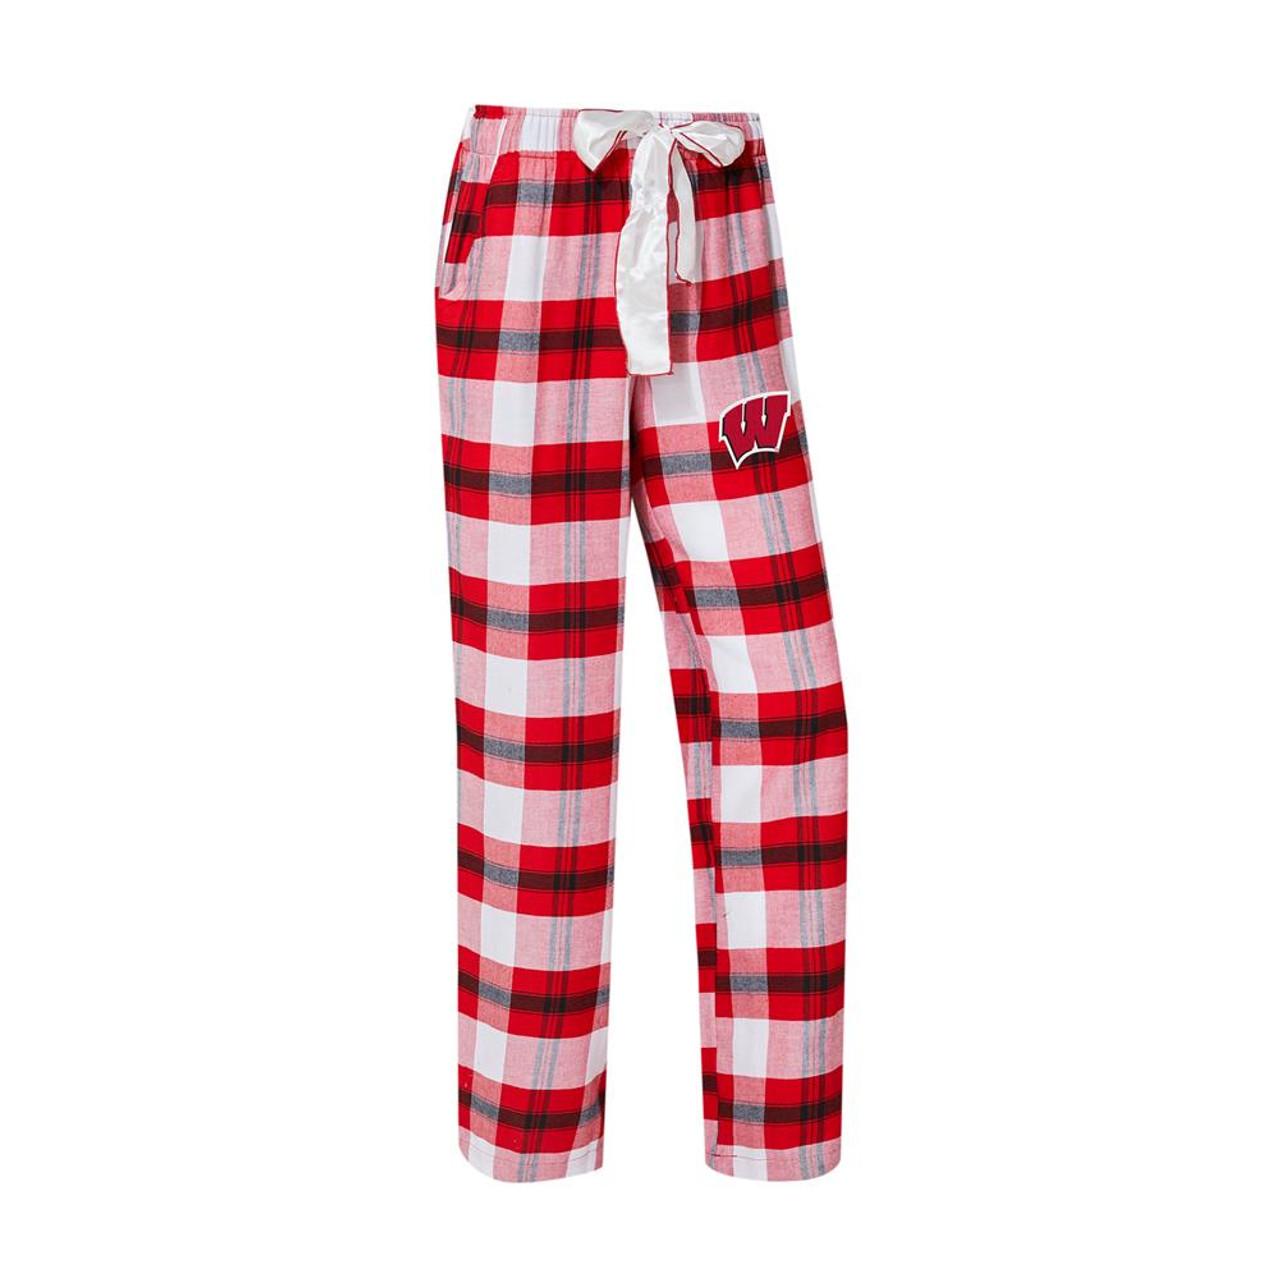 University of Wisconsin Badgers Women's Flannel Pajamas Plaid PJ Bottoms